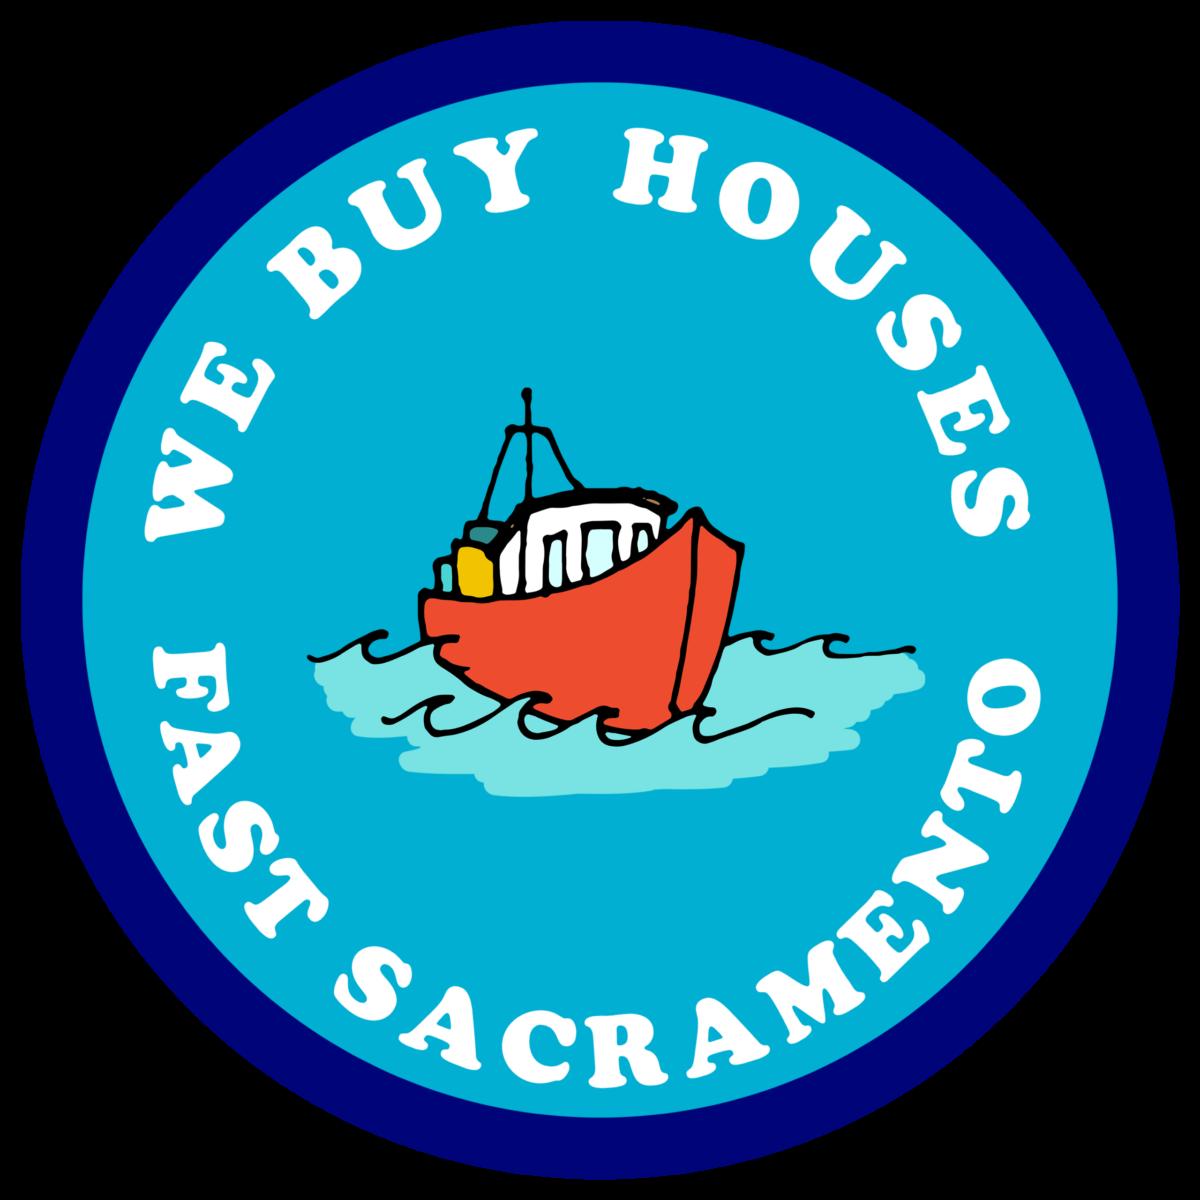 We Buy Houses Fast Sacramento  logo